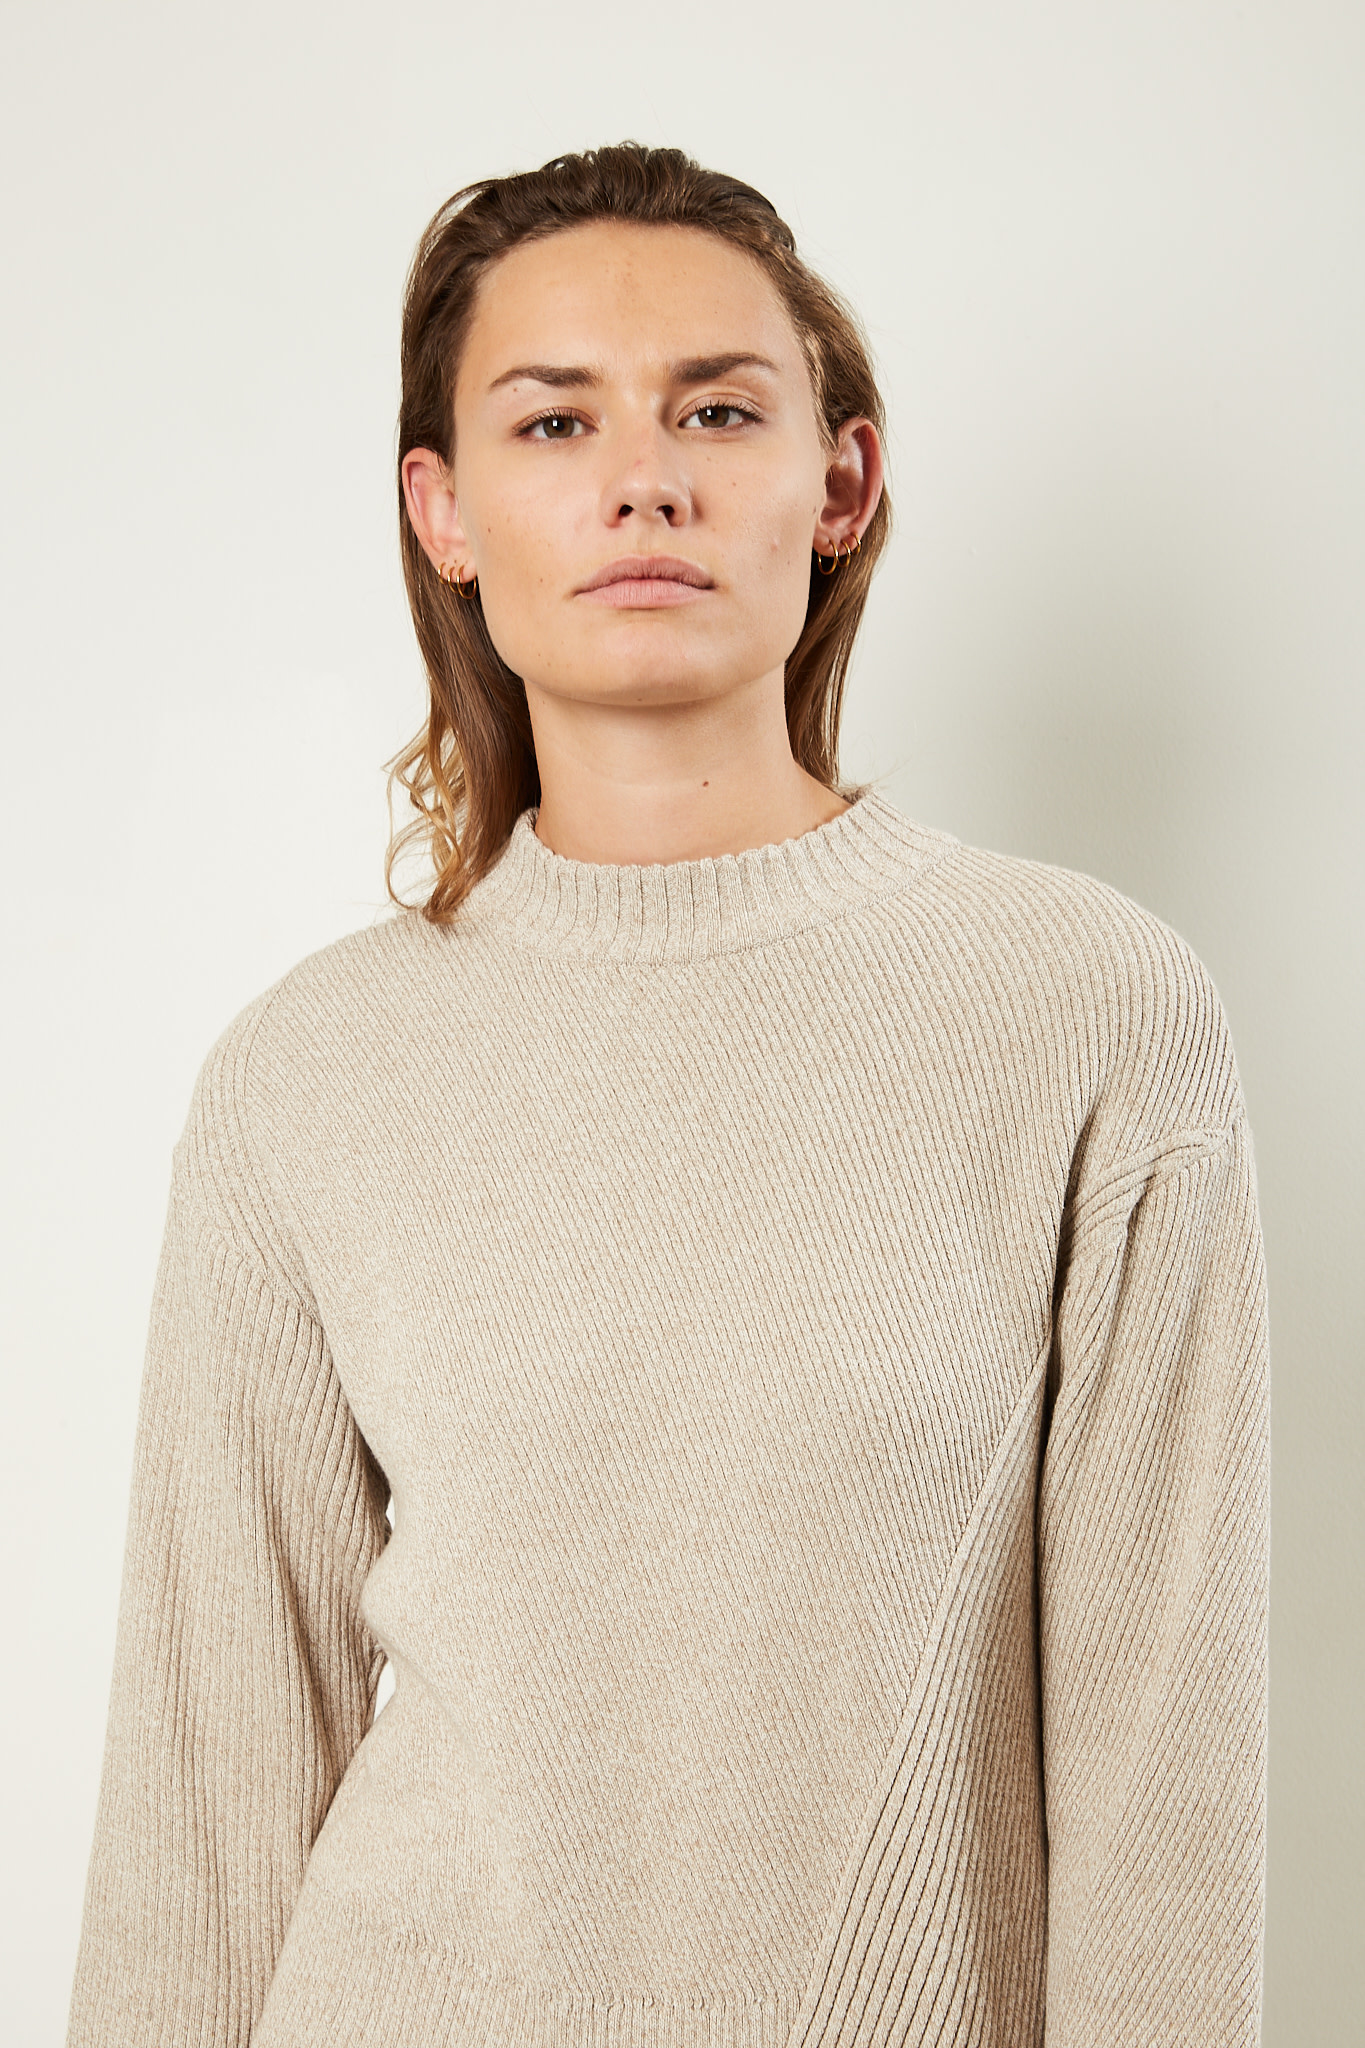 Aeron - Sommer melange knit dress